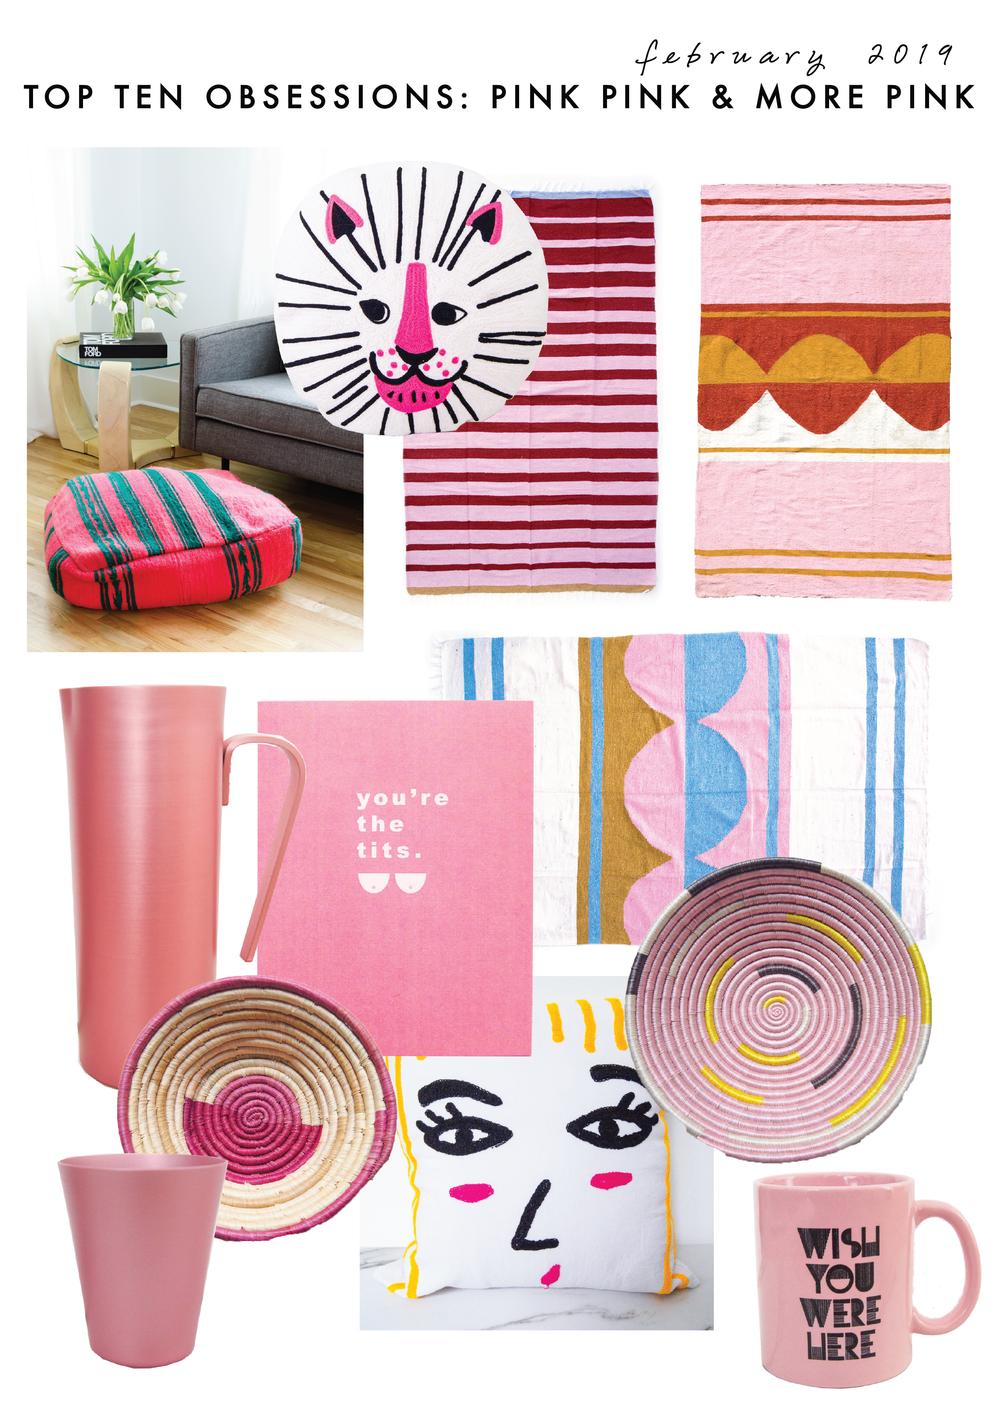 Pink + Green Pouf  //  Hello Lion Pillow  //  Havana Blanket  //  Fez Blanket  //  Geneva Blanket  //  Matte Rose Pitcher  //  You're The Tit's Card  //  Selfie Pillow  //  Sunset Lover Bowl  //  Marfa Bowl  //  Matte Rose Tumbler  //  Wish You Were Here Mug